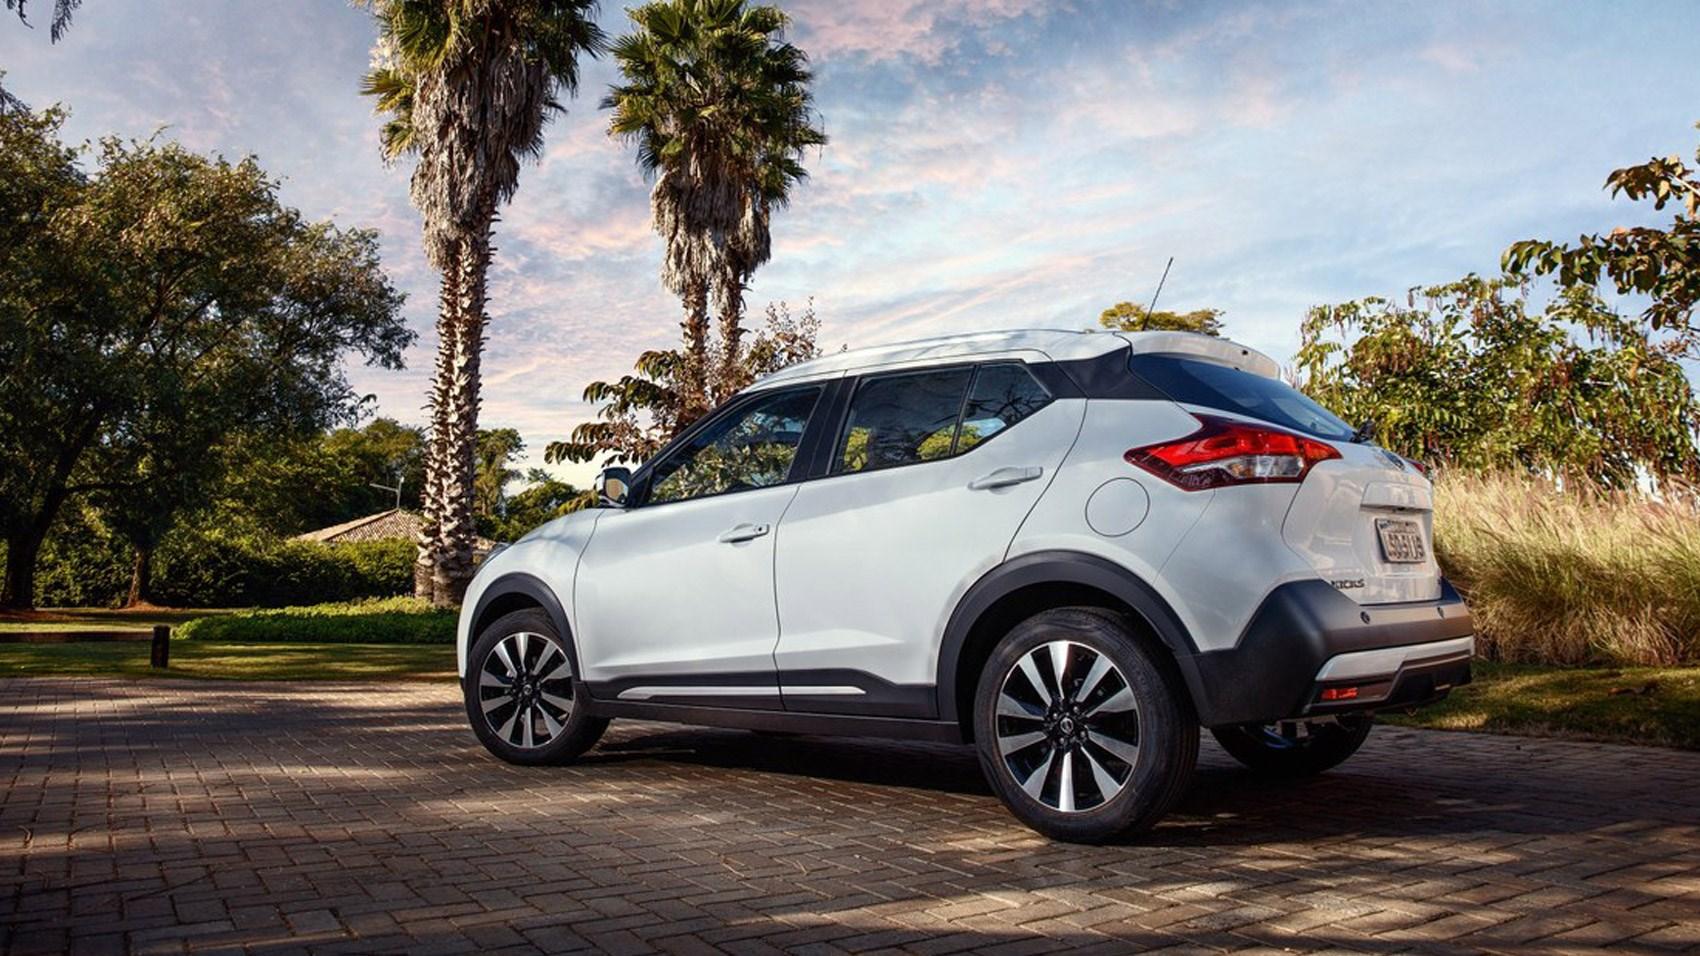 Nissan Kicks SL 1.6 16v (2016) review | CAR Magazine